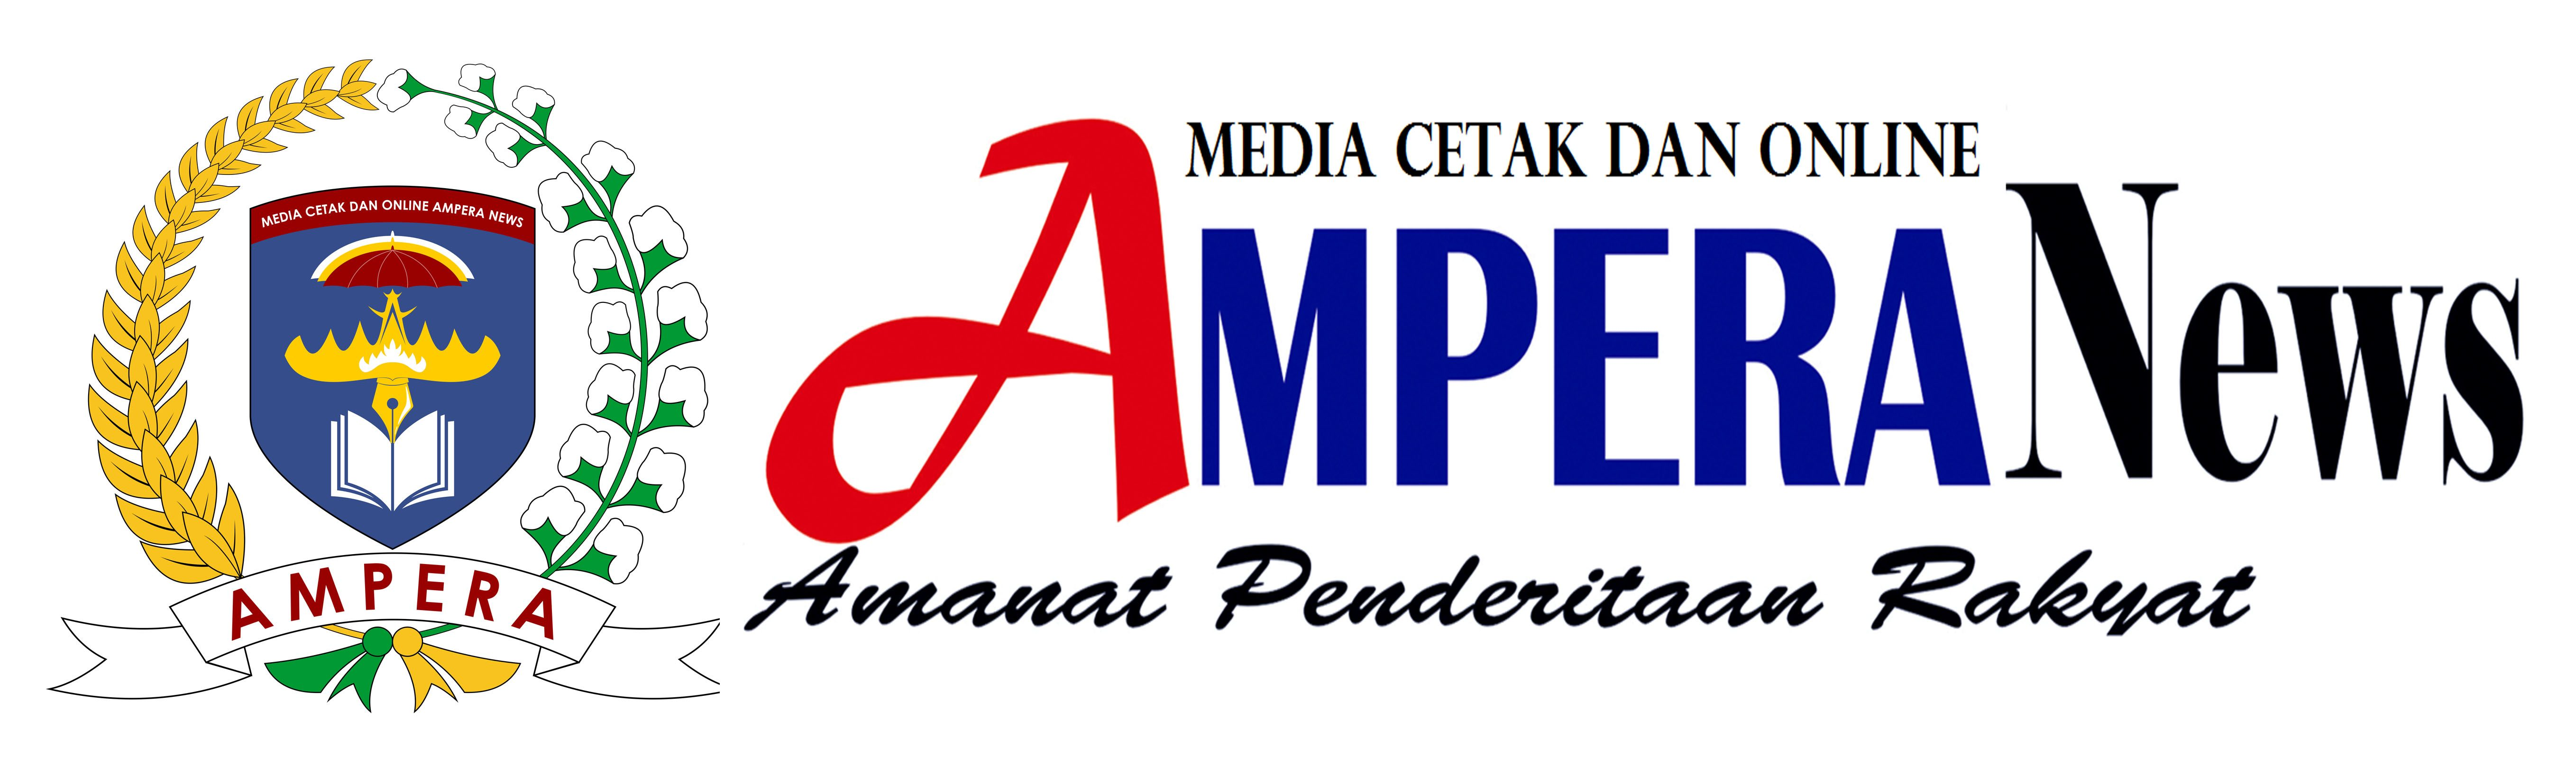 AMPERA-NEWS